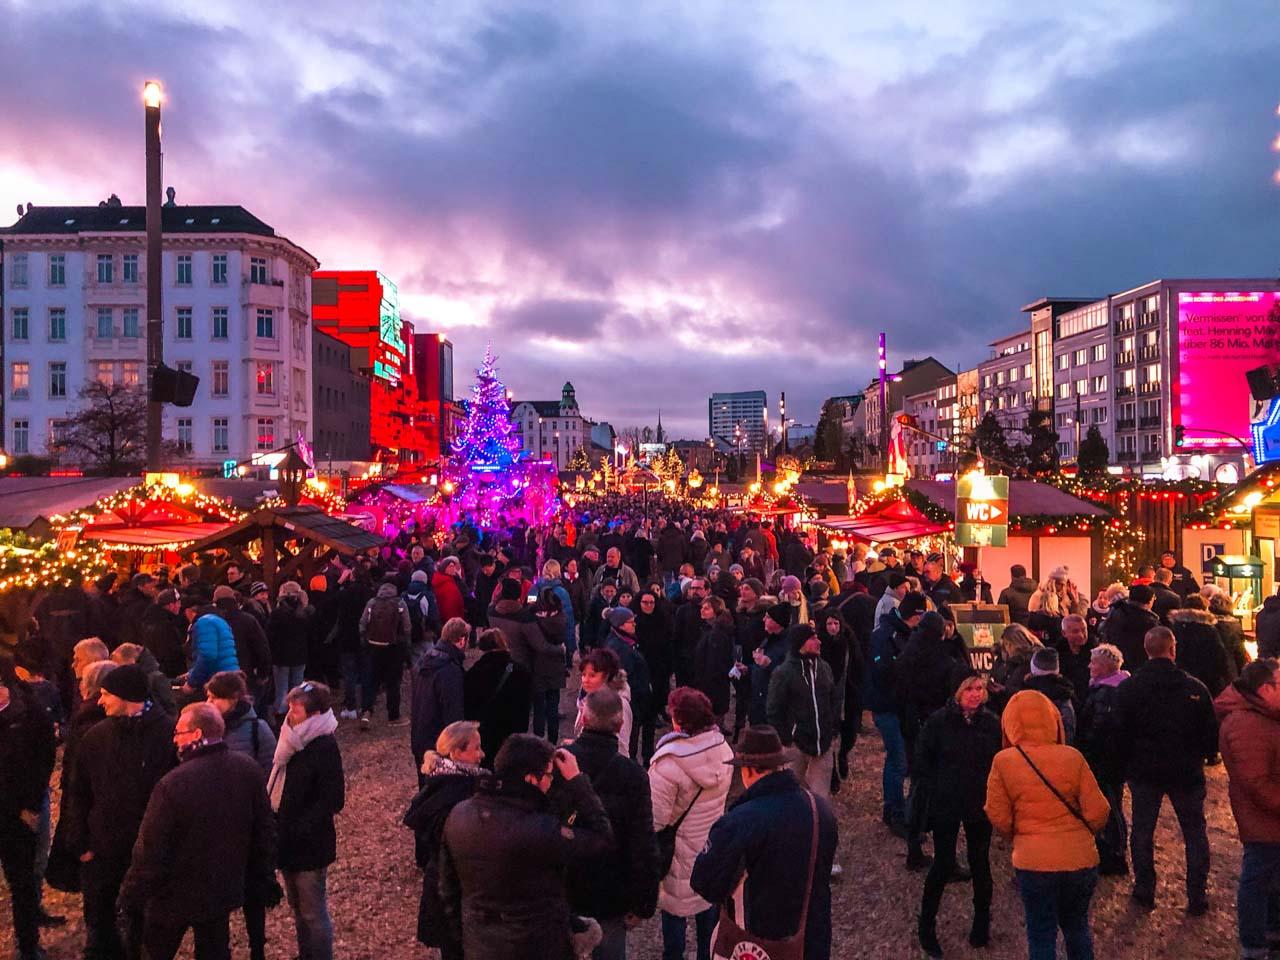 People at the St. Pauli Christmas market